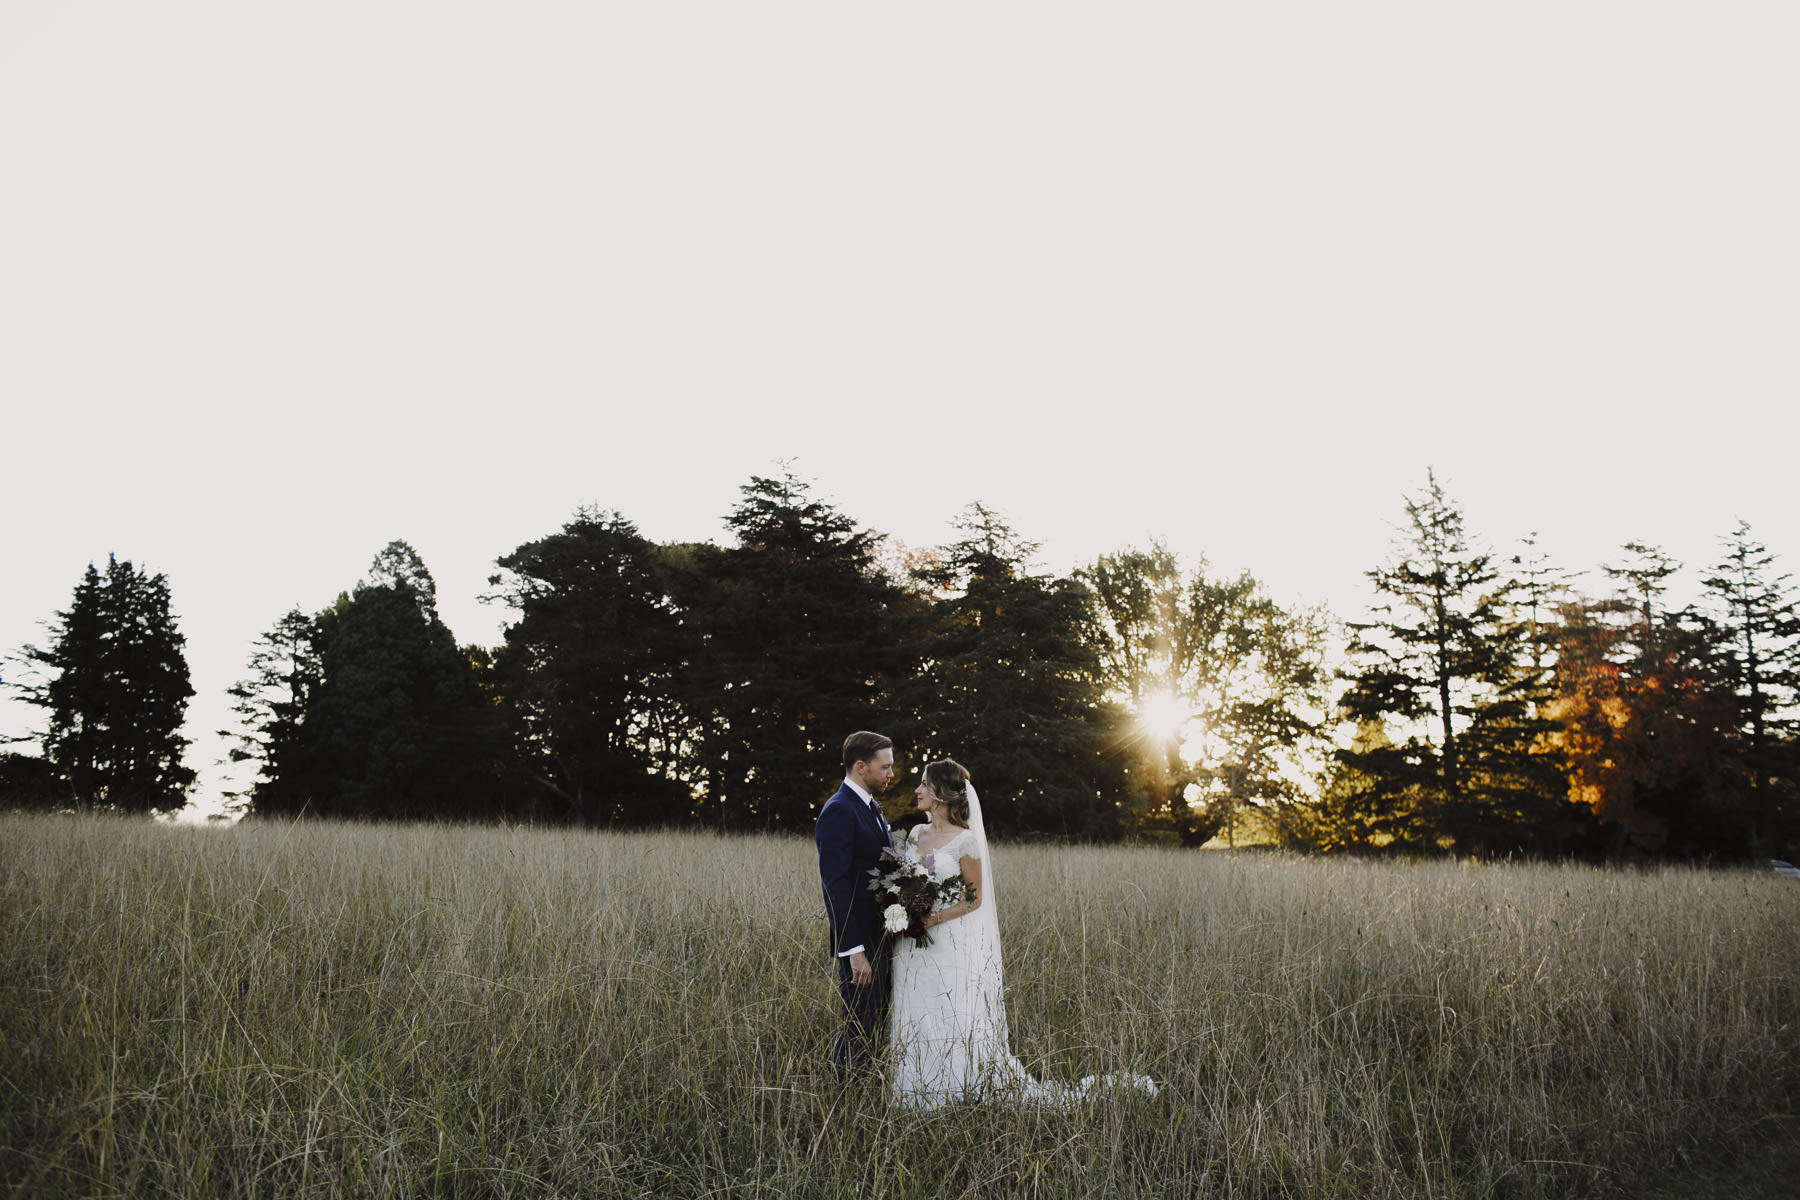 160506_justinaaron_wedding_holly_daniel_pr-172.jpg